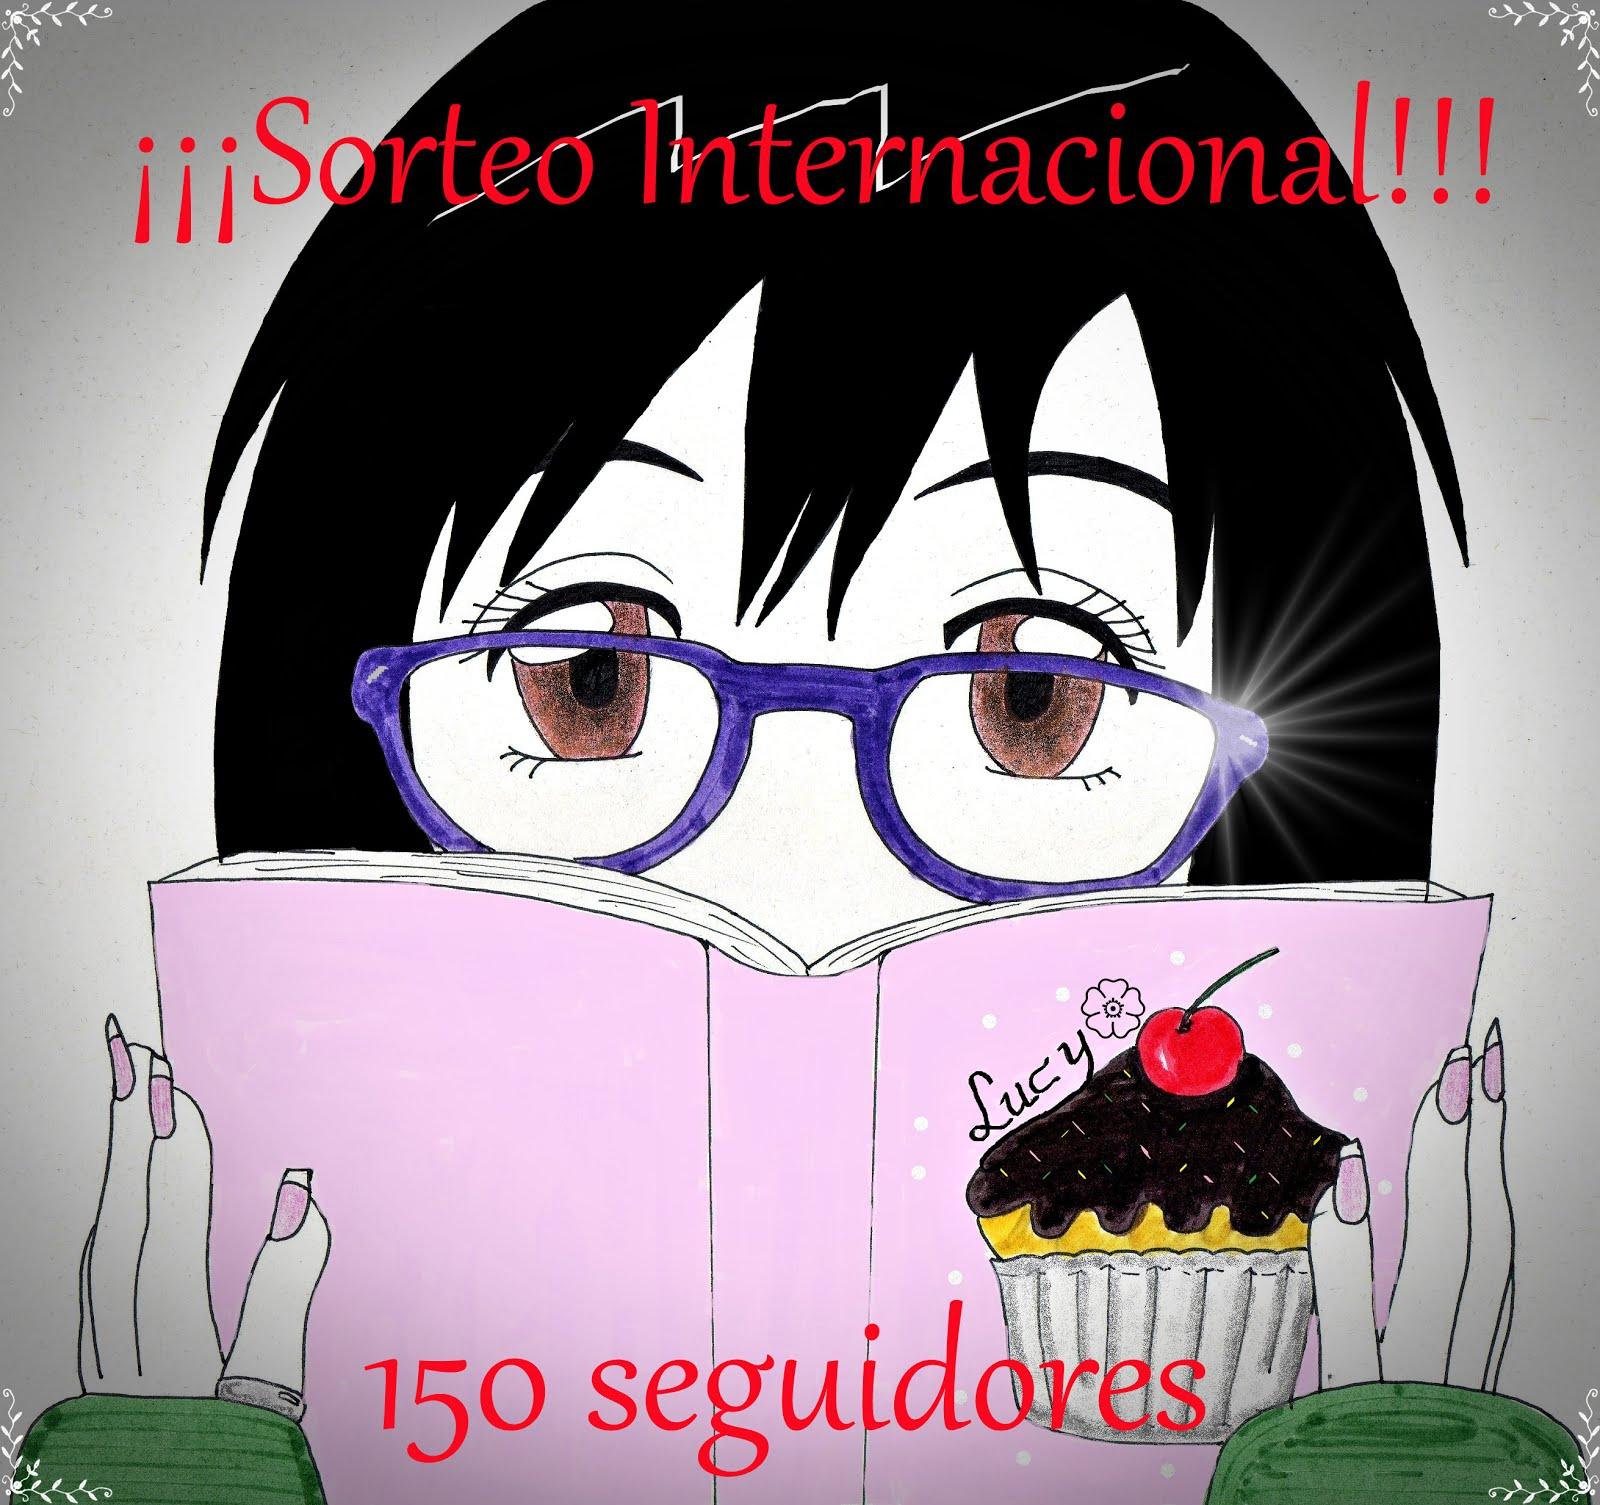 SORTEO INTERNACIONAL - 150 SEGUIDORES ¡¡PARTICIPA!!